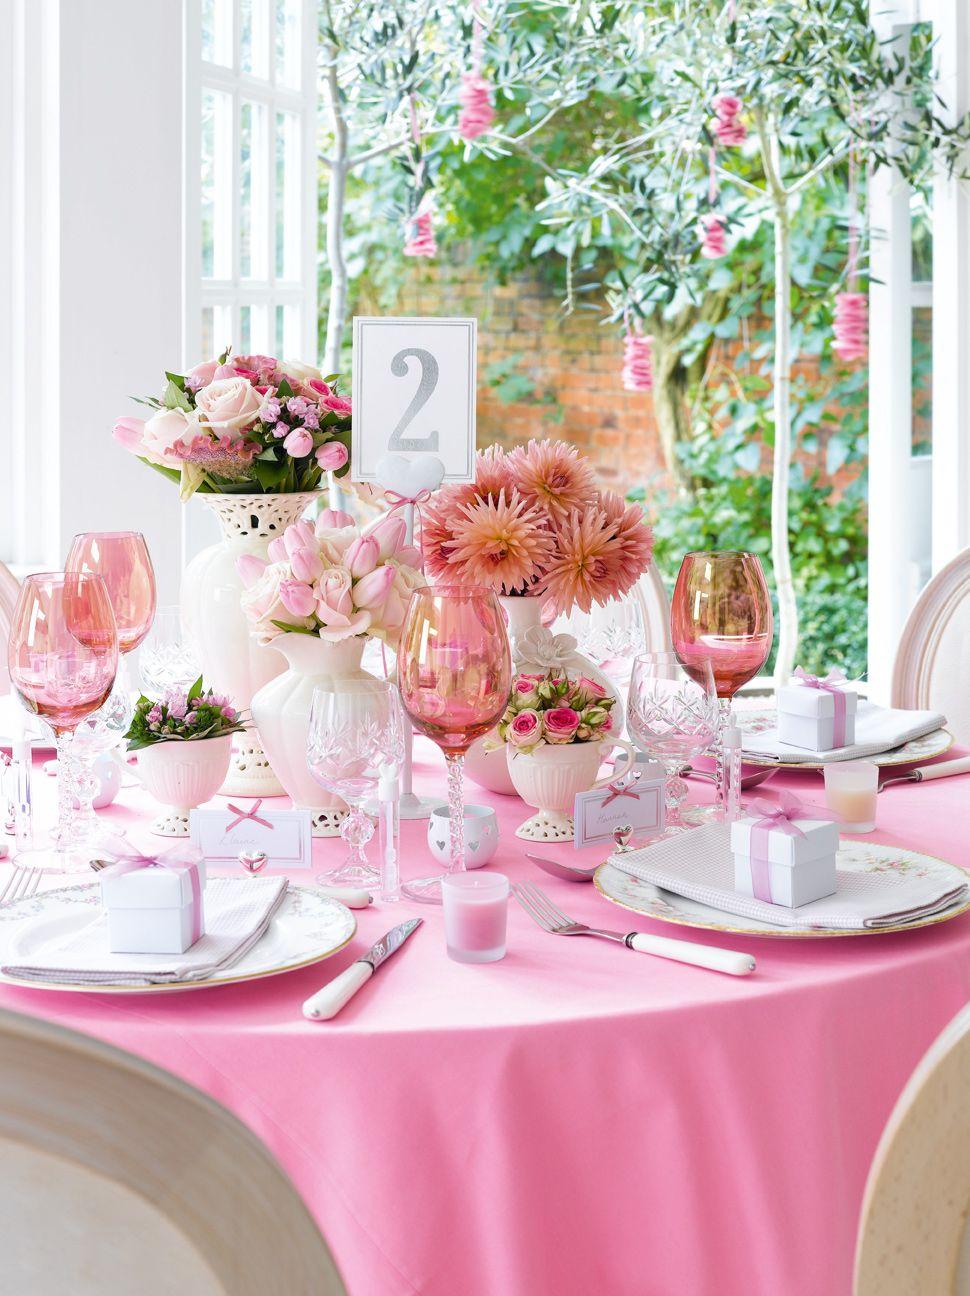 Rose heart theme wedding wedding ideas pinterest table rose heart theme wedding junglespirit Image collections